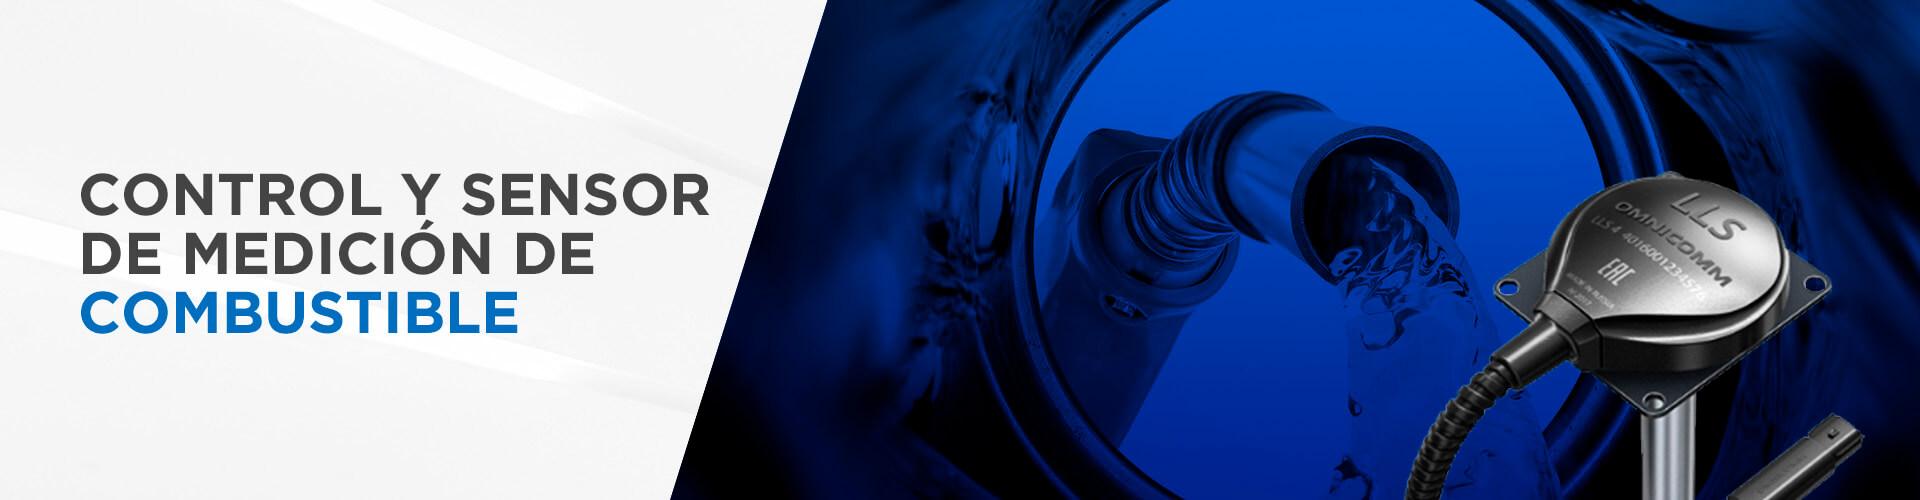 telematica-control-combustible